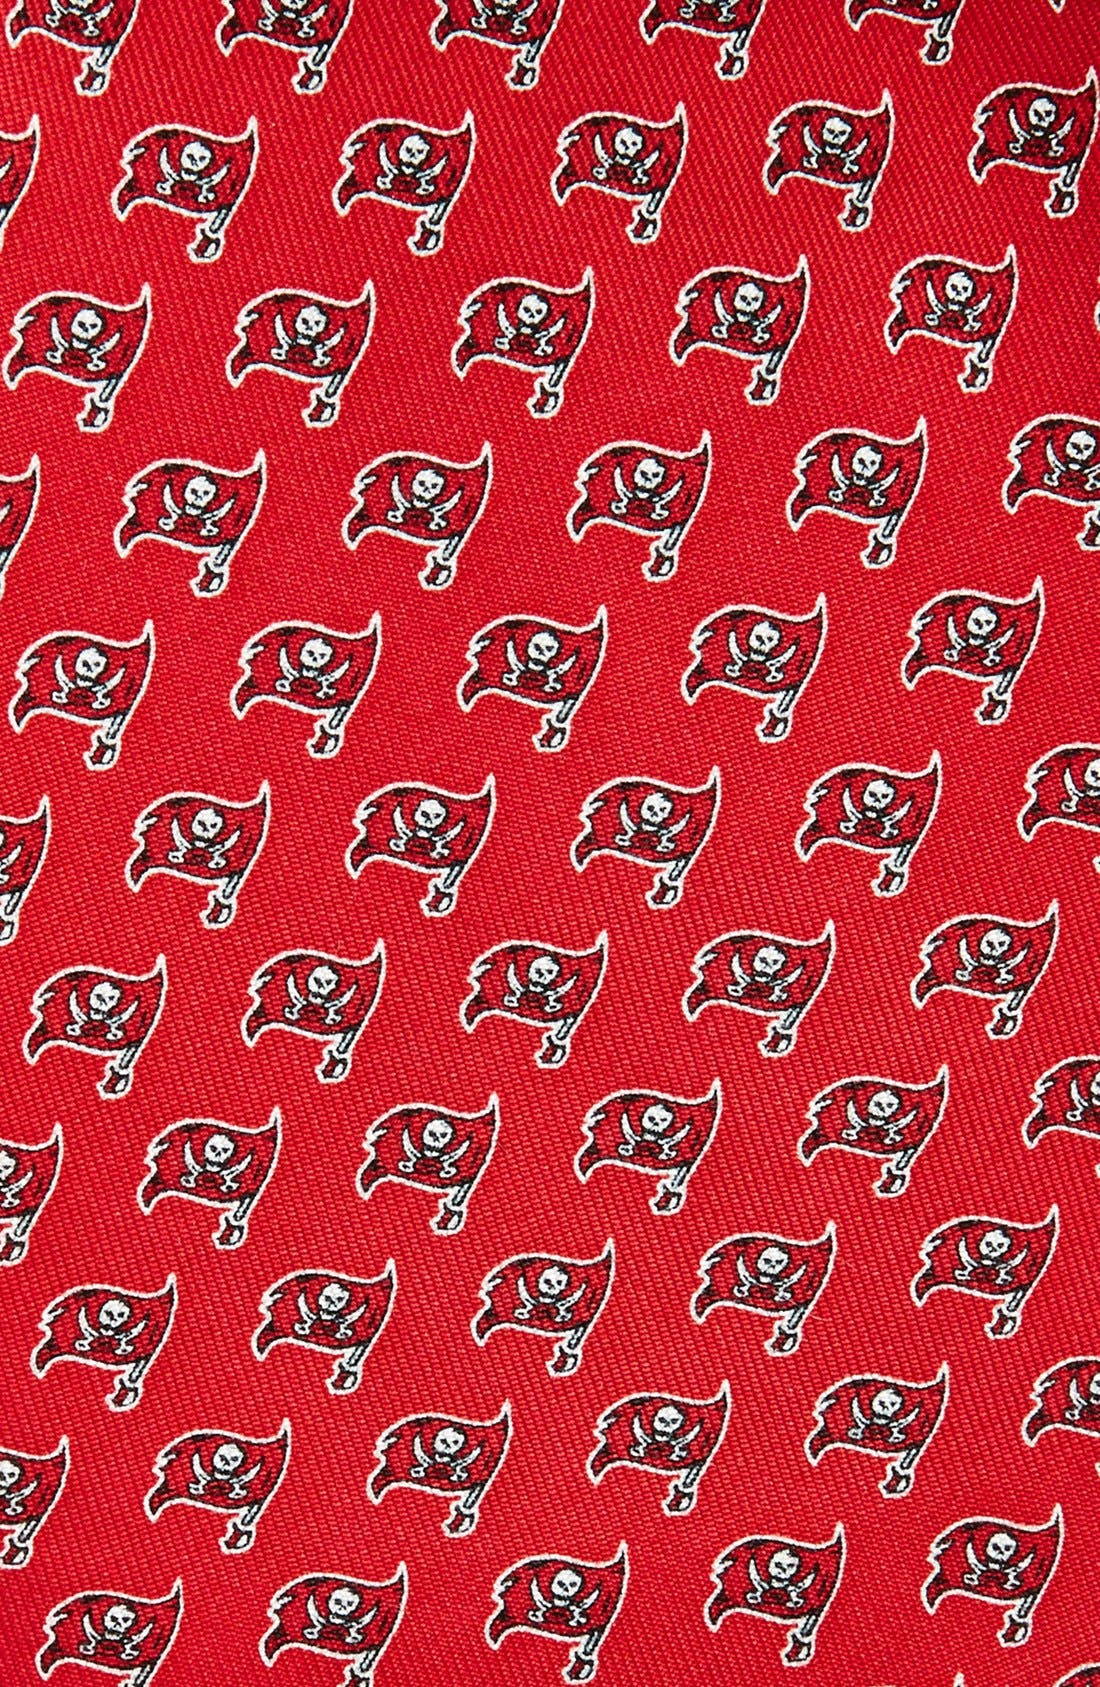 Tampa Bay Buccaneers - NFL Woven Silk Tie,                             Alternate thumbnail 2, color,